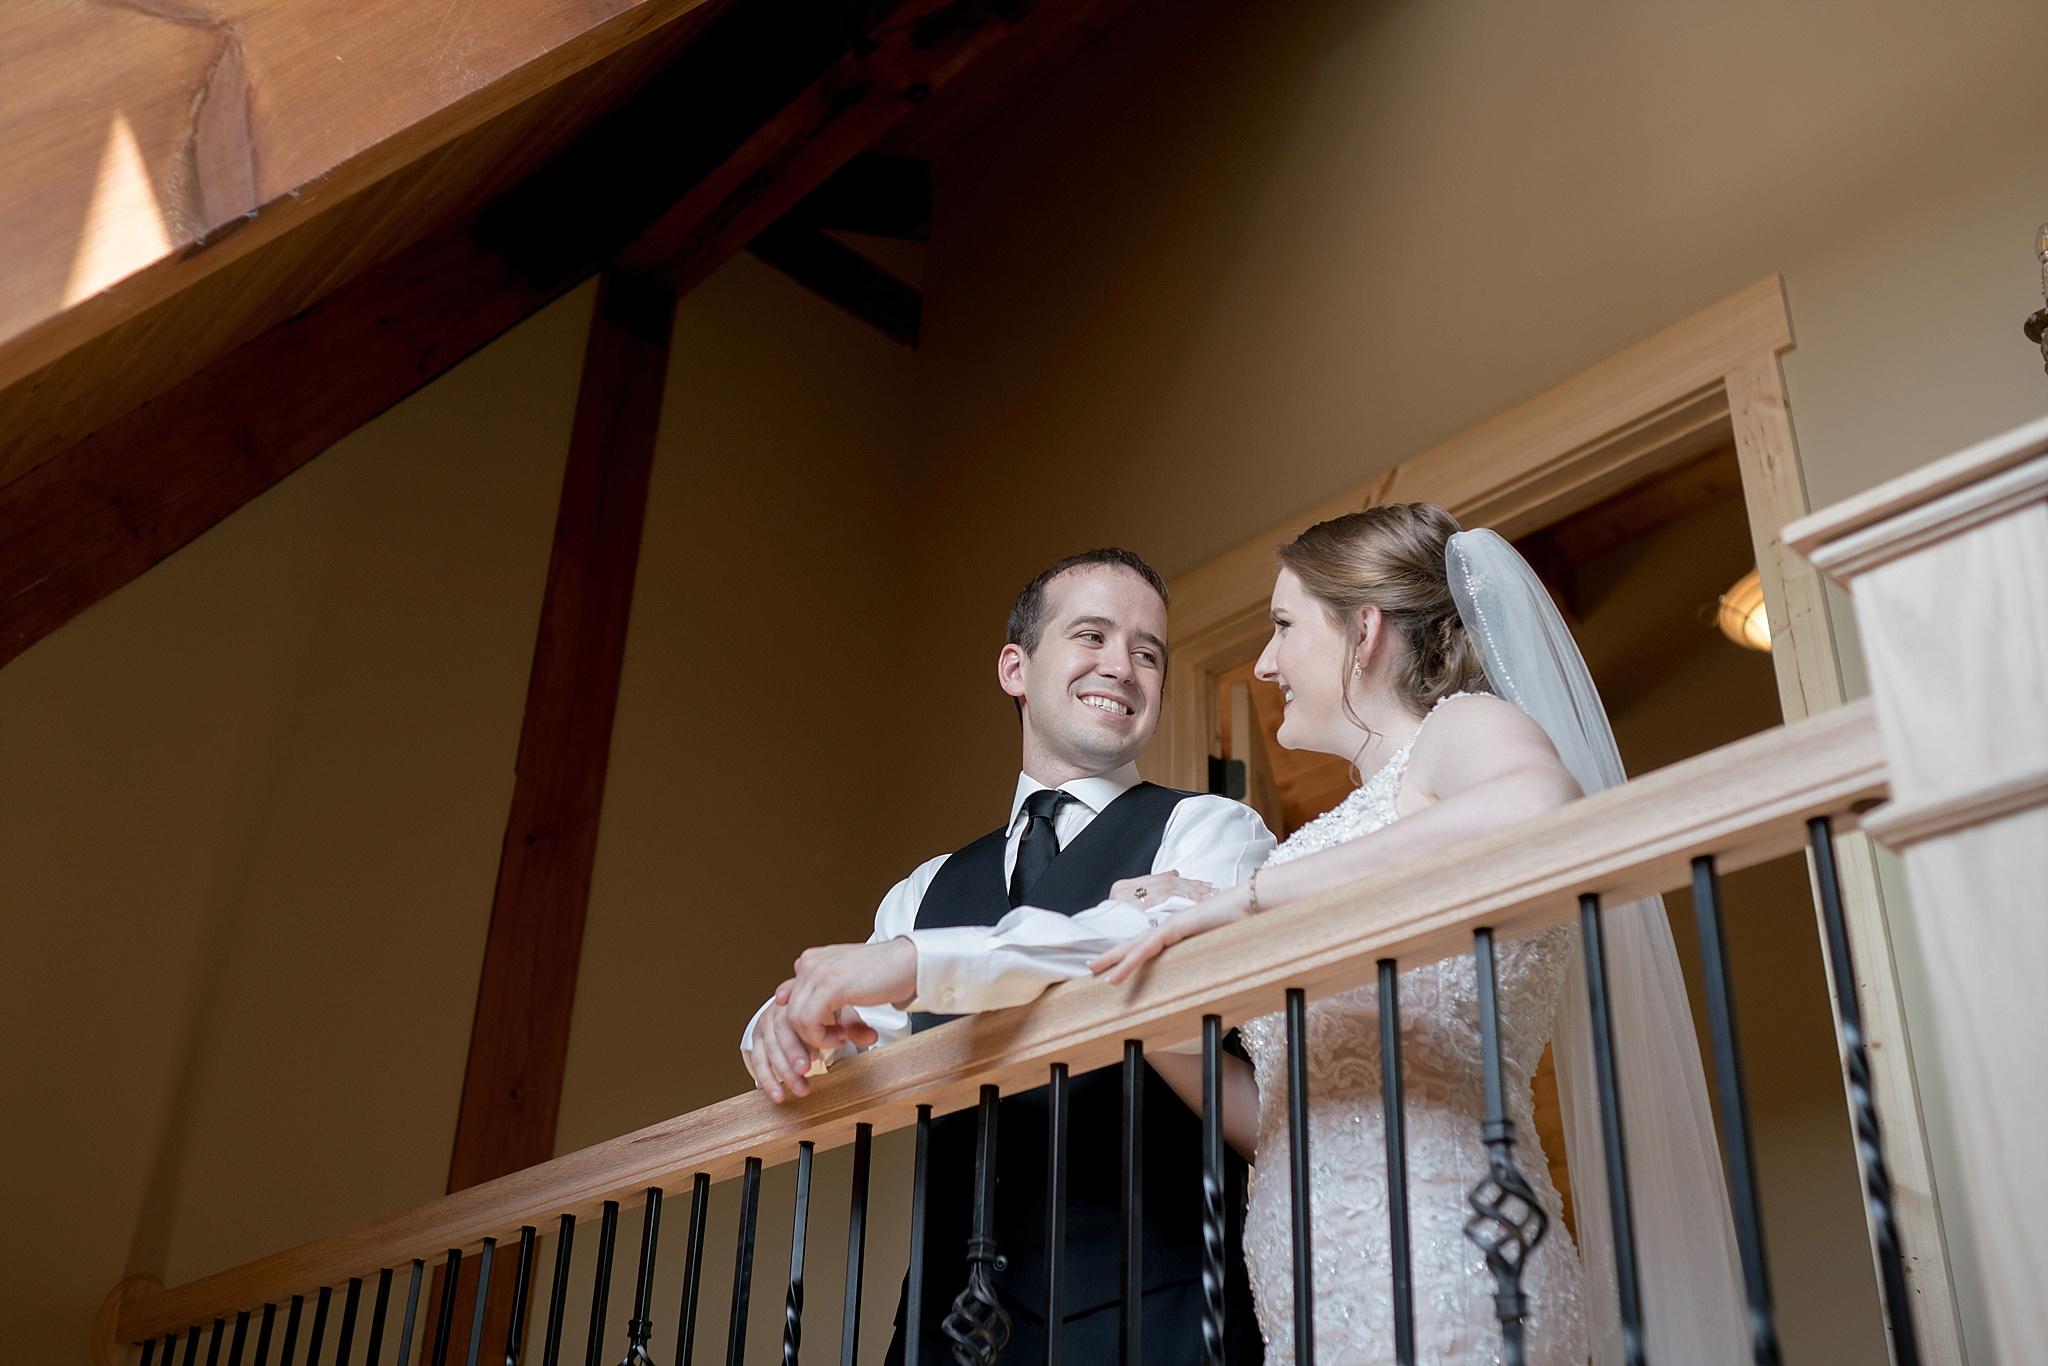 Pavilion-Carriage-Farms-Wedding-Photographer-214.jpg